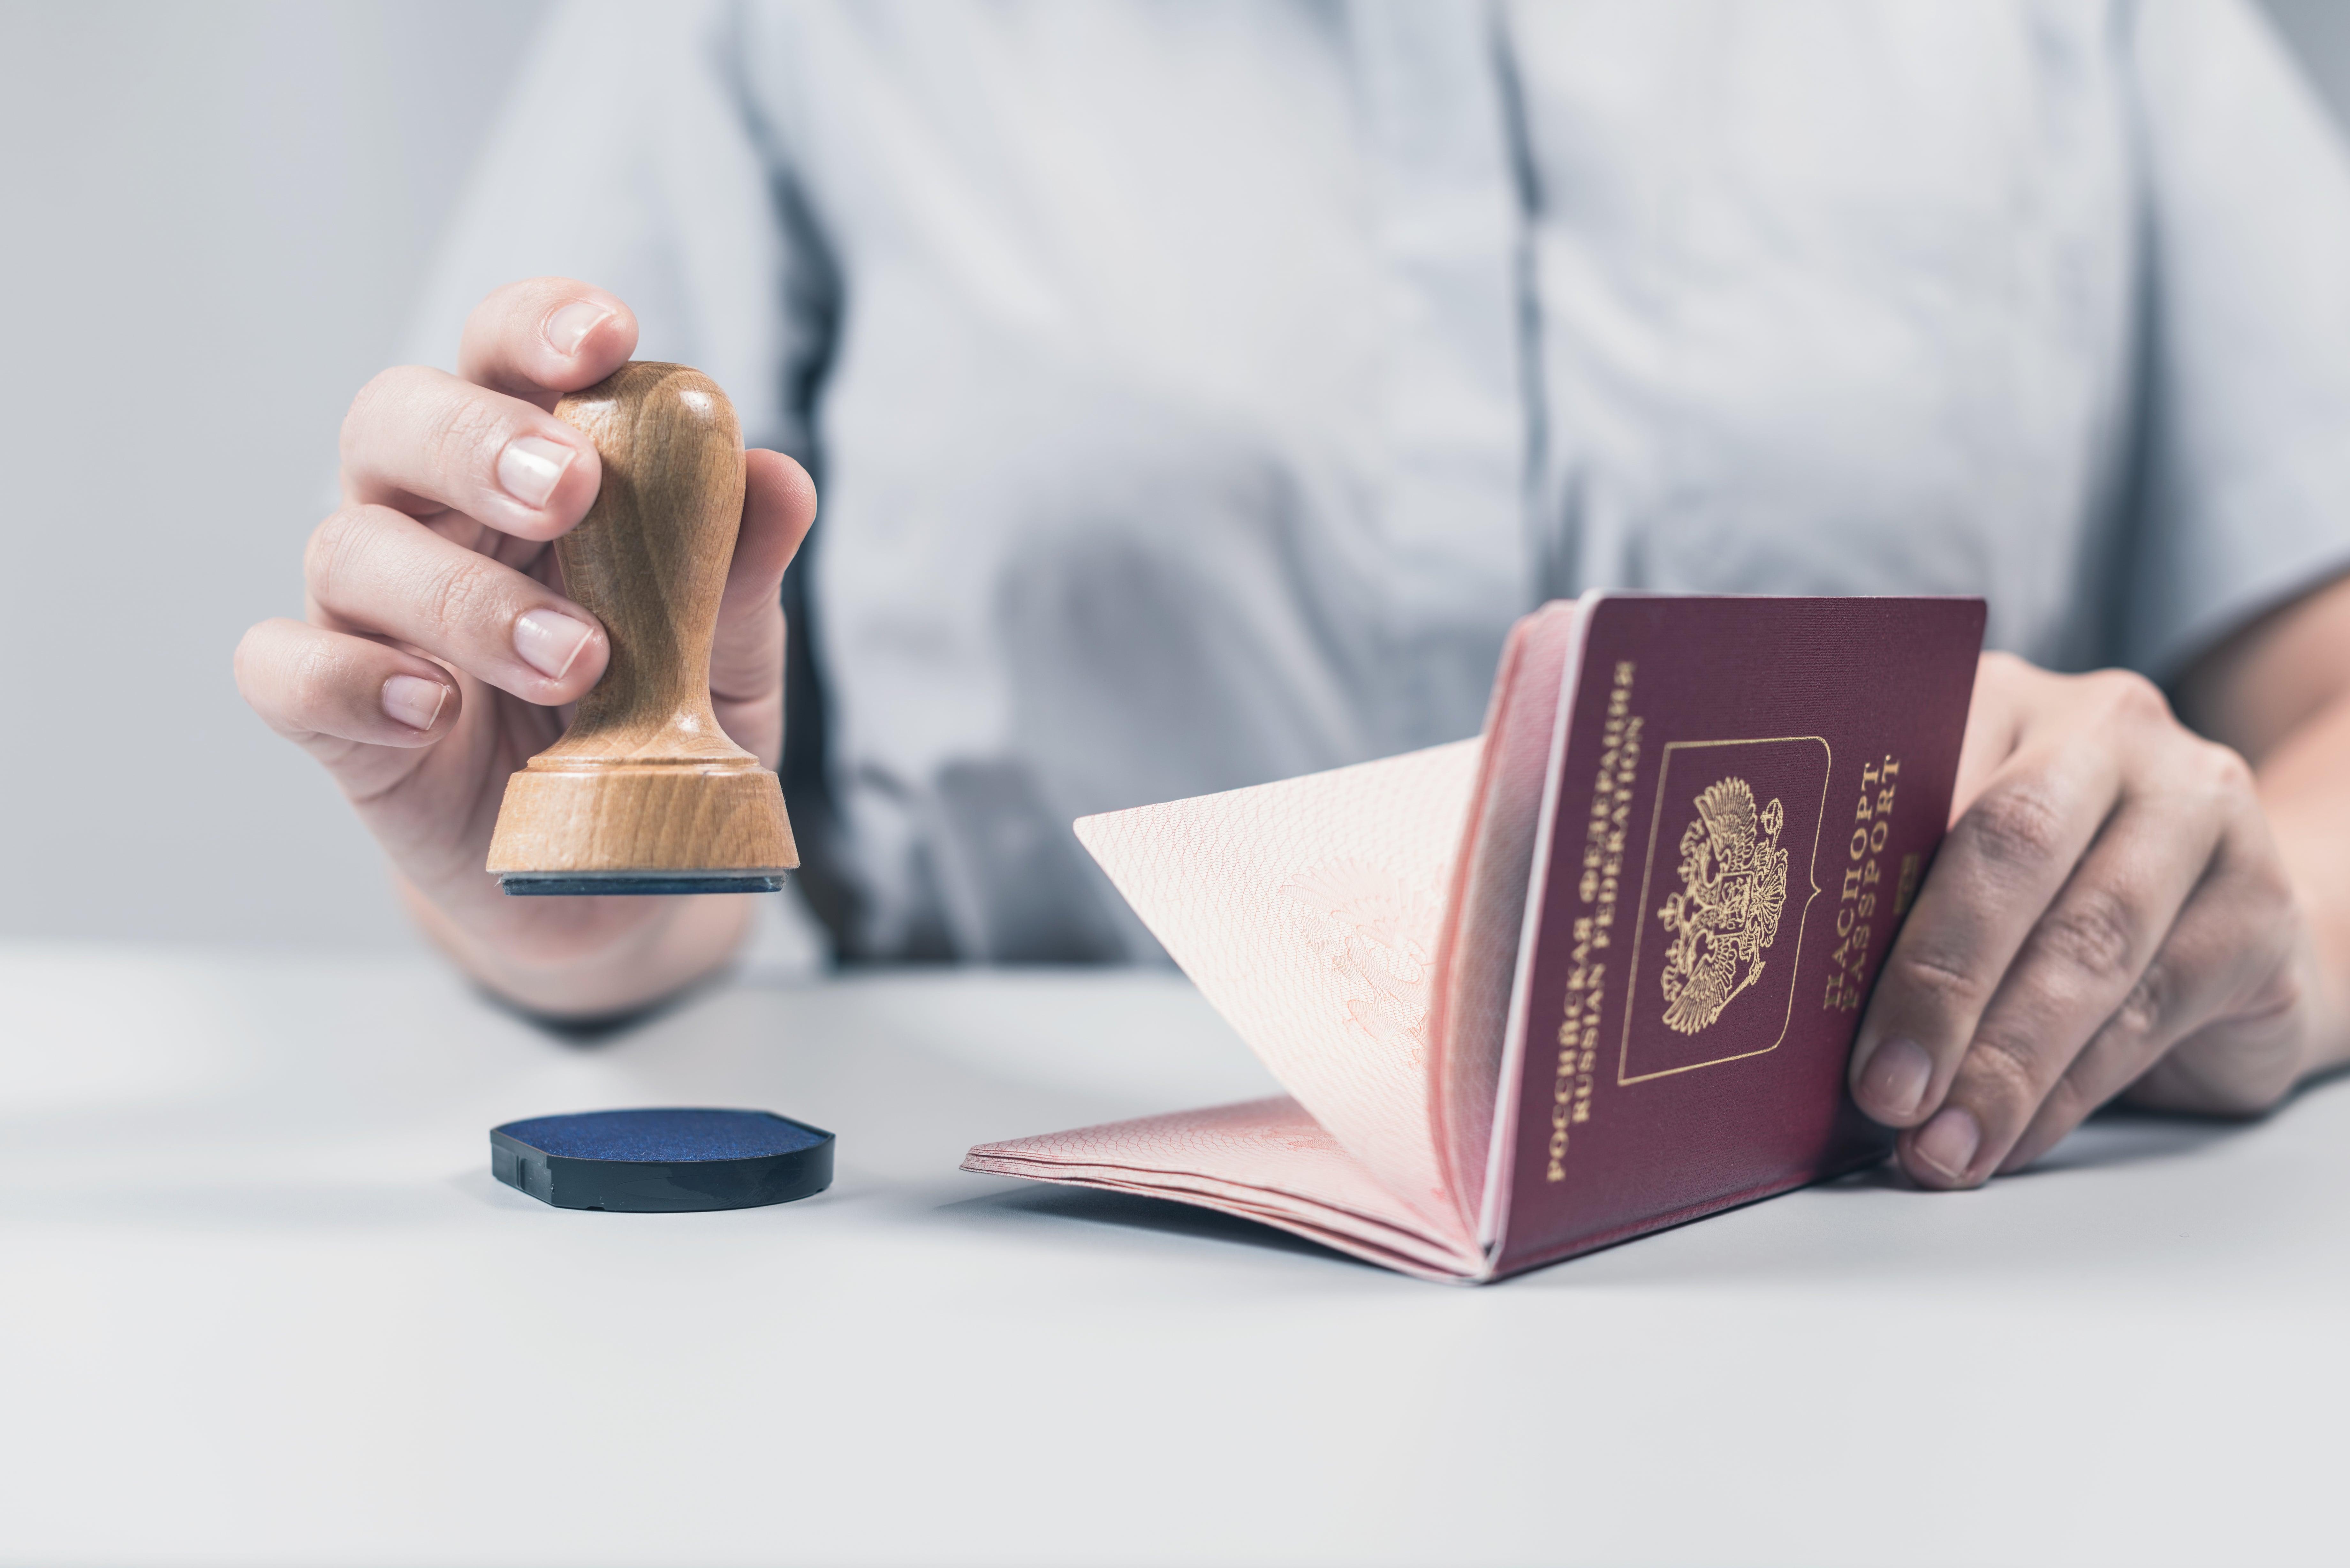 H-1B visa stamping: H-1B visa interview documents and more